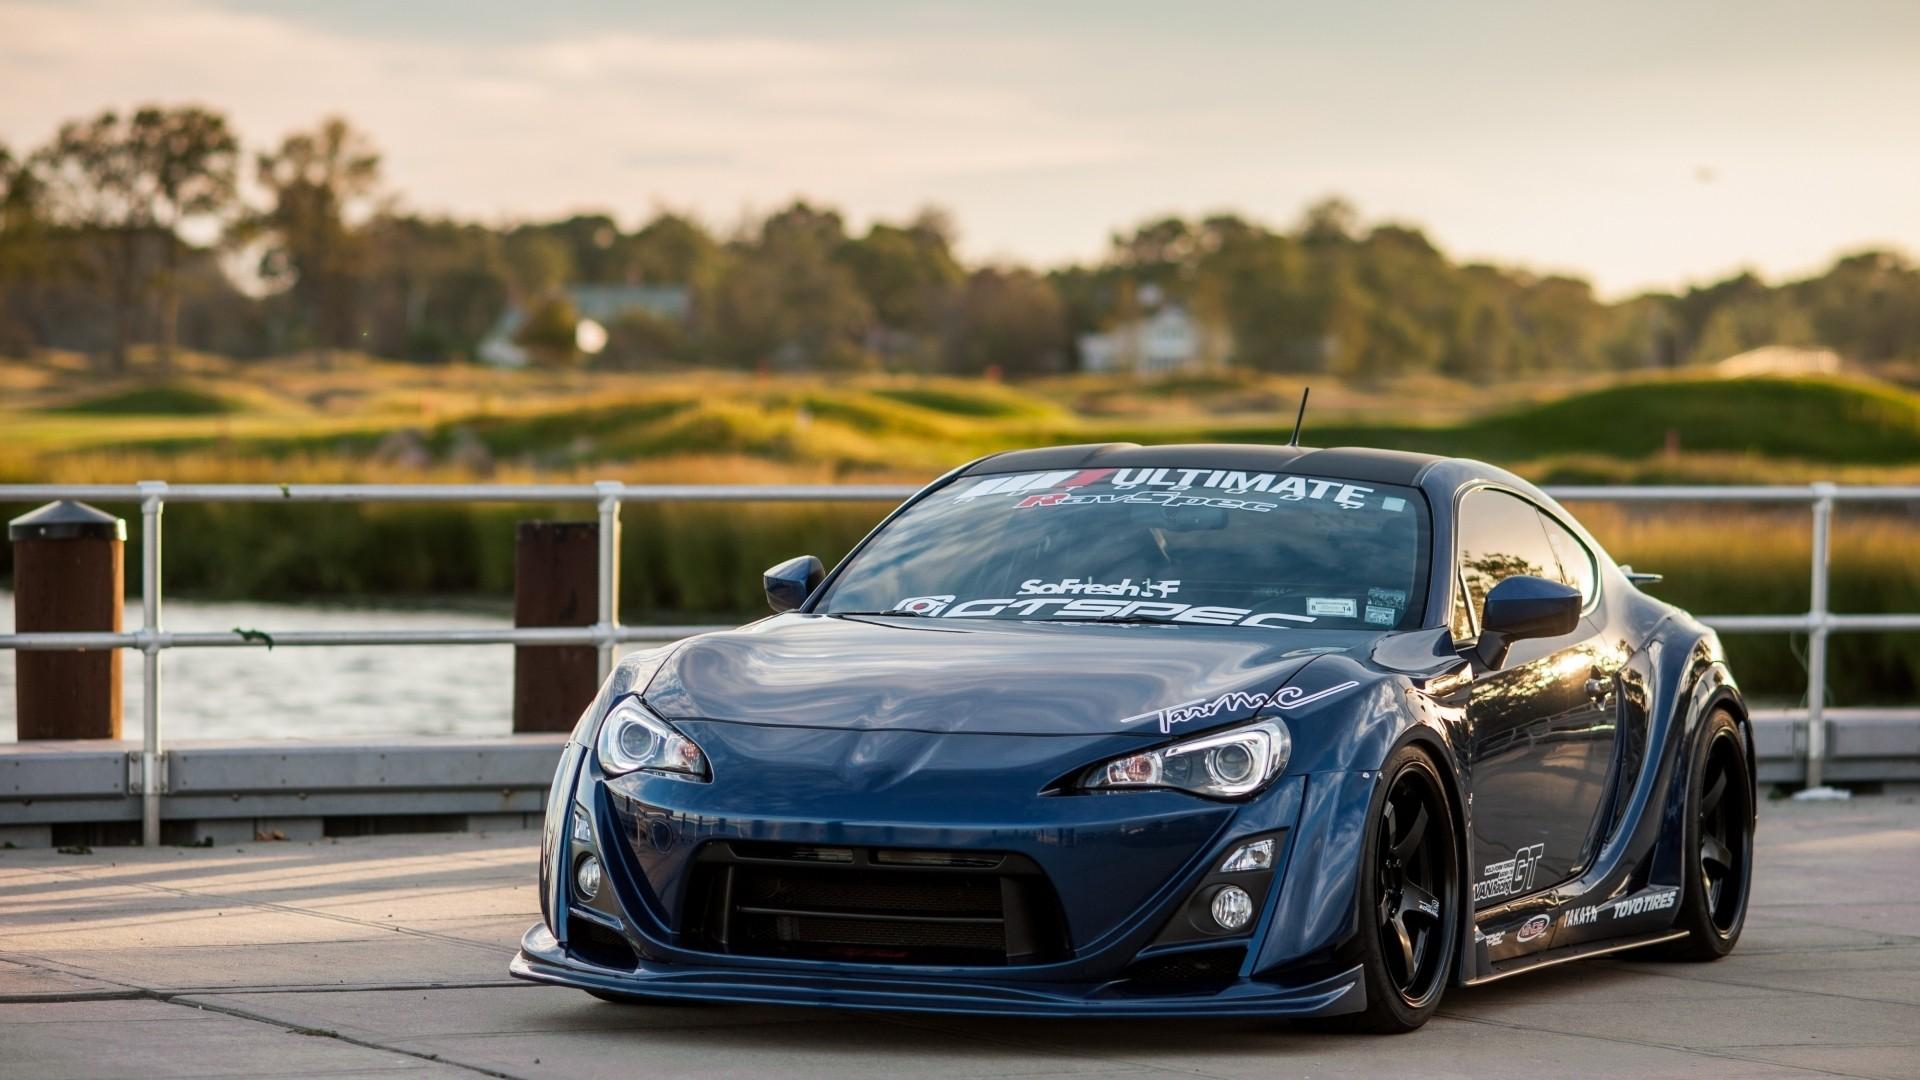 Toyota Wallpaper Free